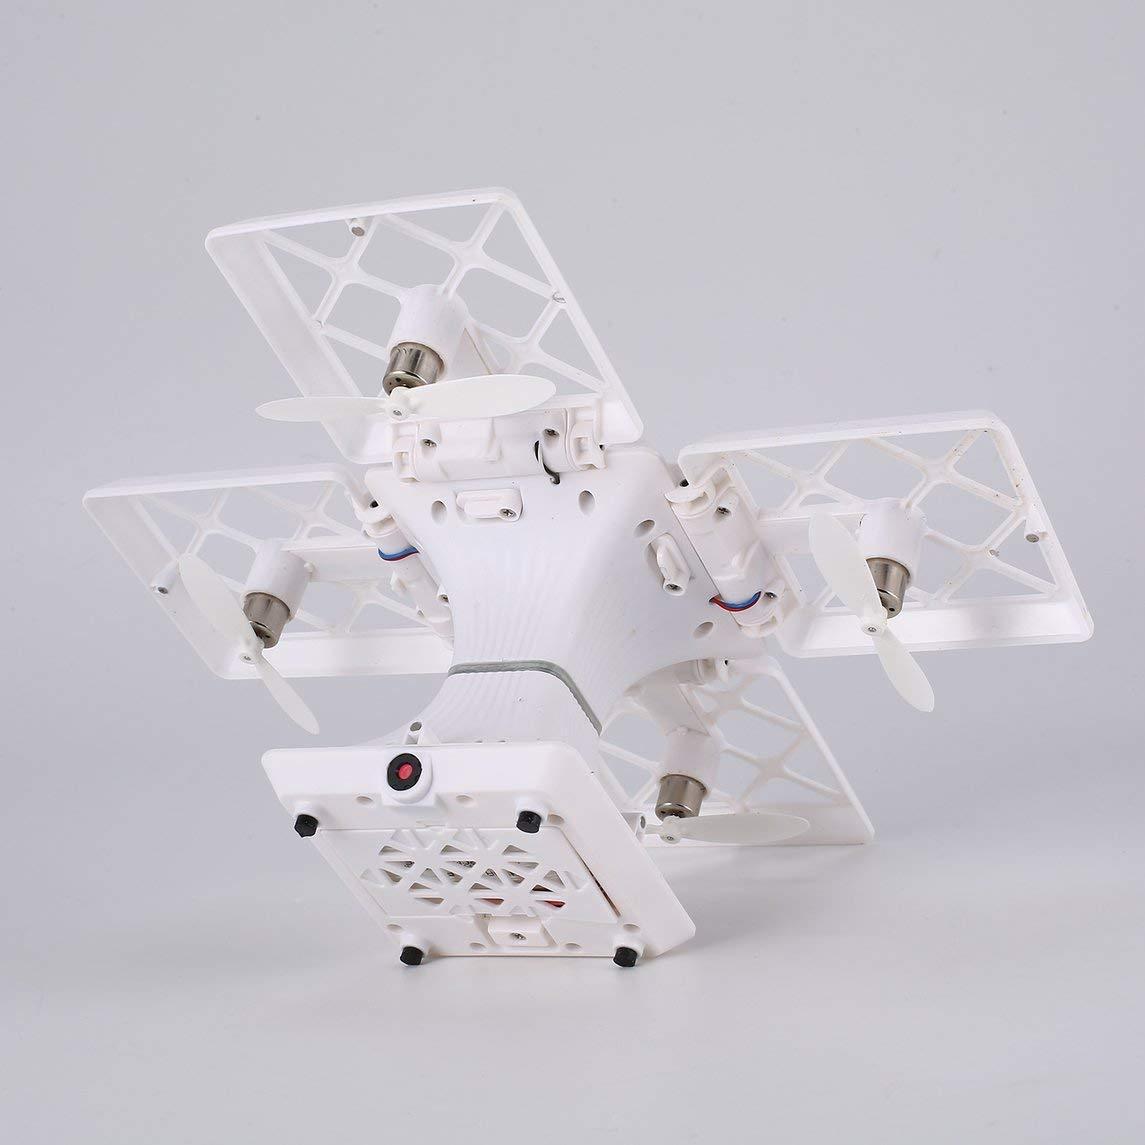 Footprintse 414 414 414 2.4G Selfie FPV Faltbare RC Drone Quadcopter mit Höhe halten 720P HD WiFi Kamera Headless Modus 3D Flips One Key Return-Farbe: Weiß 7fc8ec